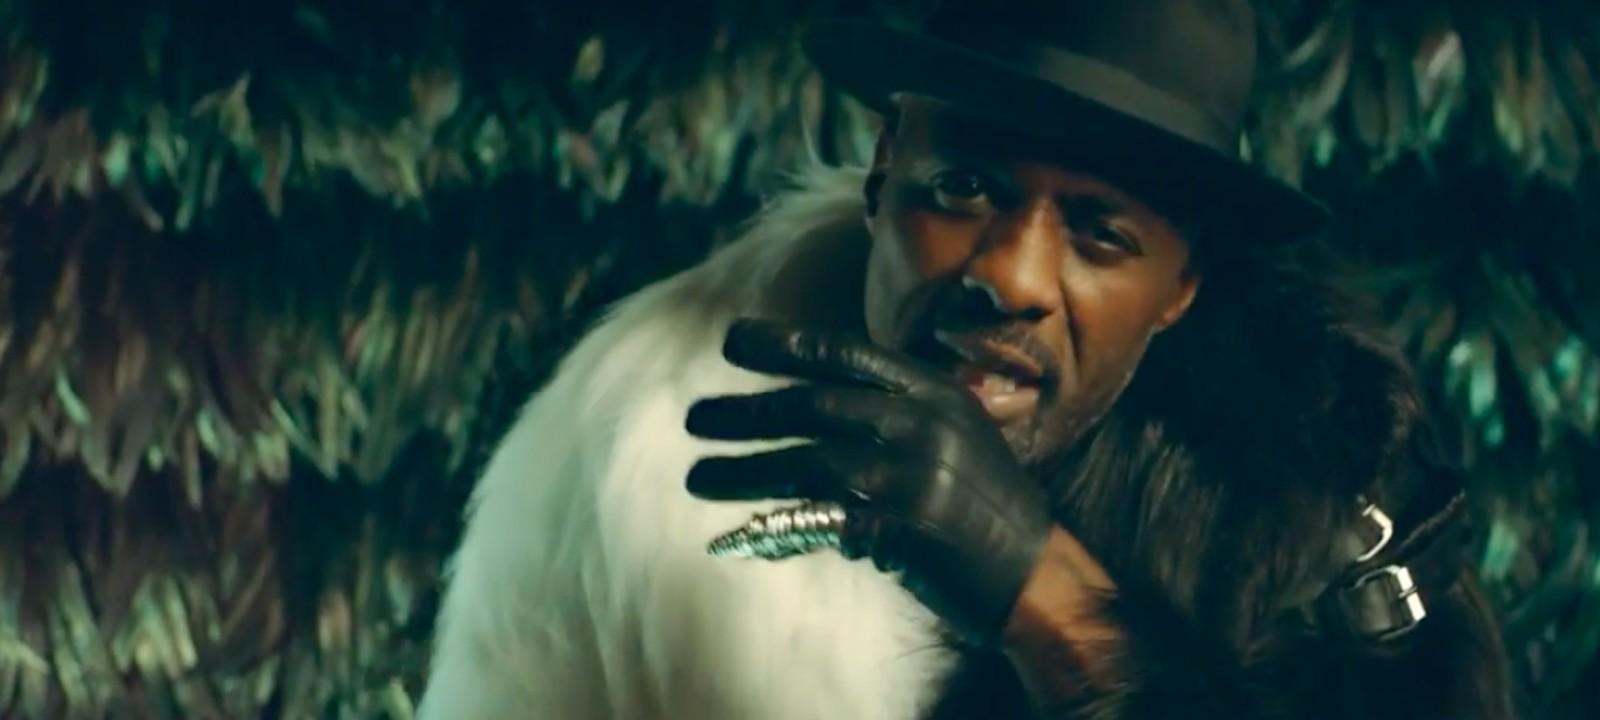 Idris Elba in video for Macklemore's 'Dance Off'